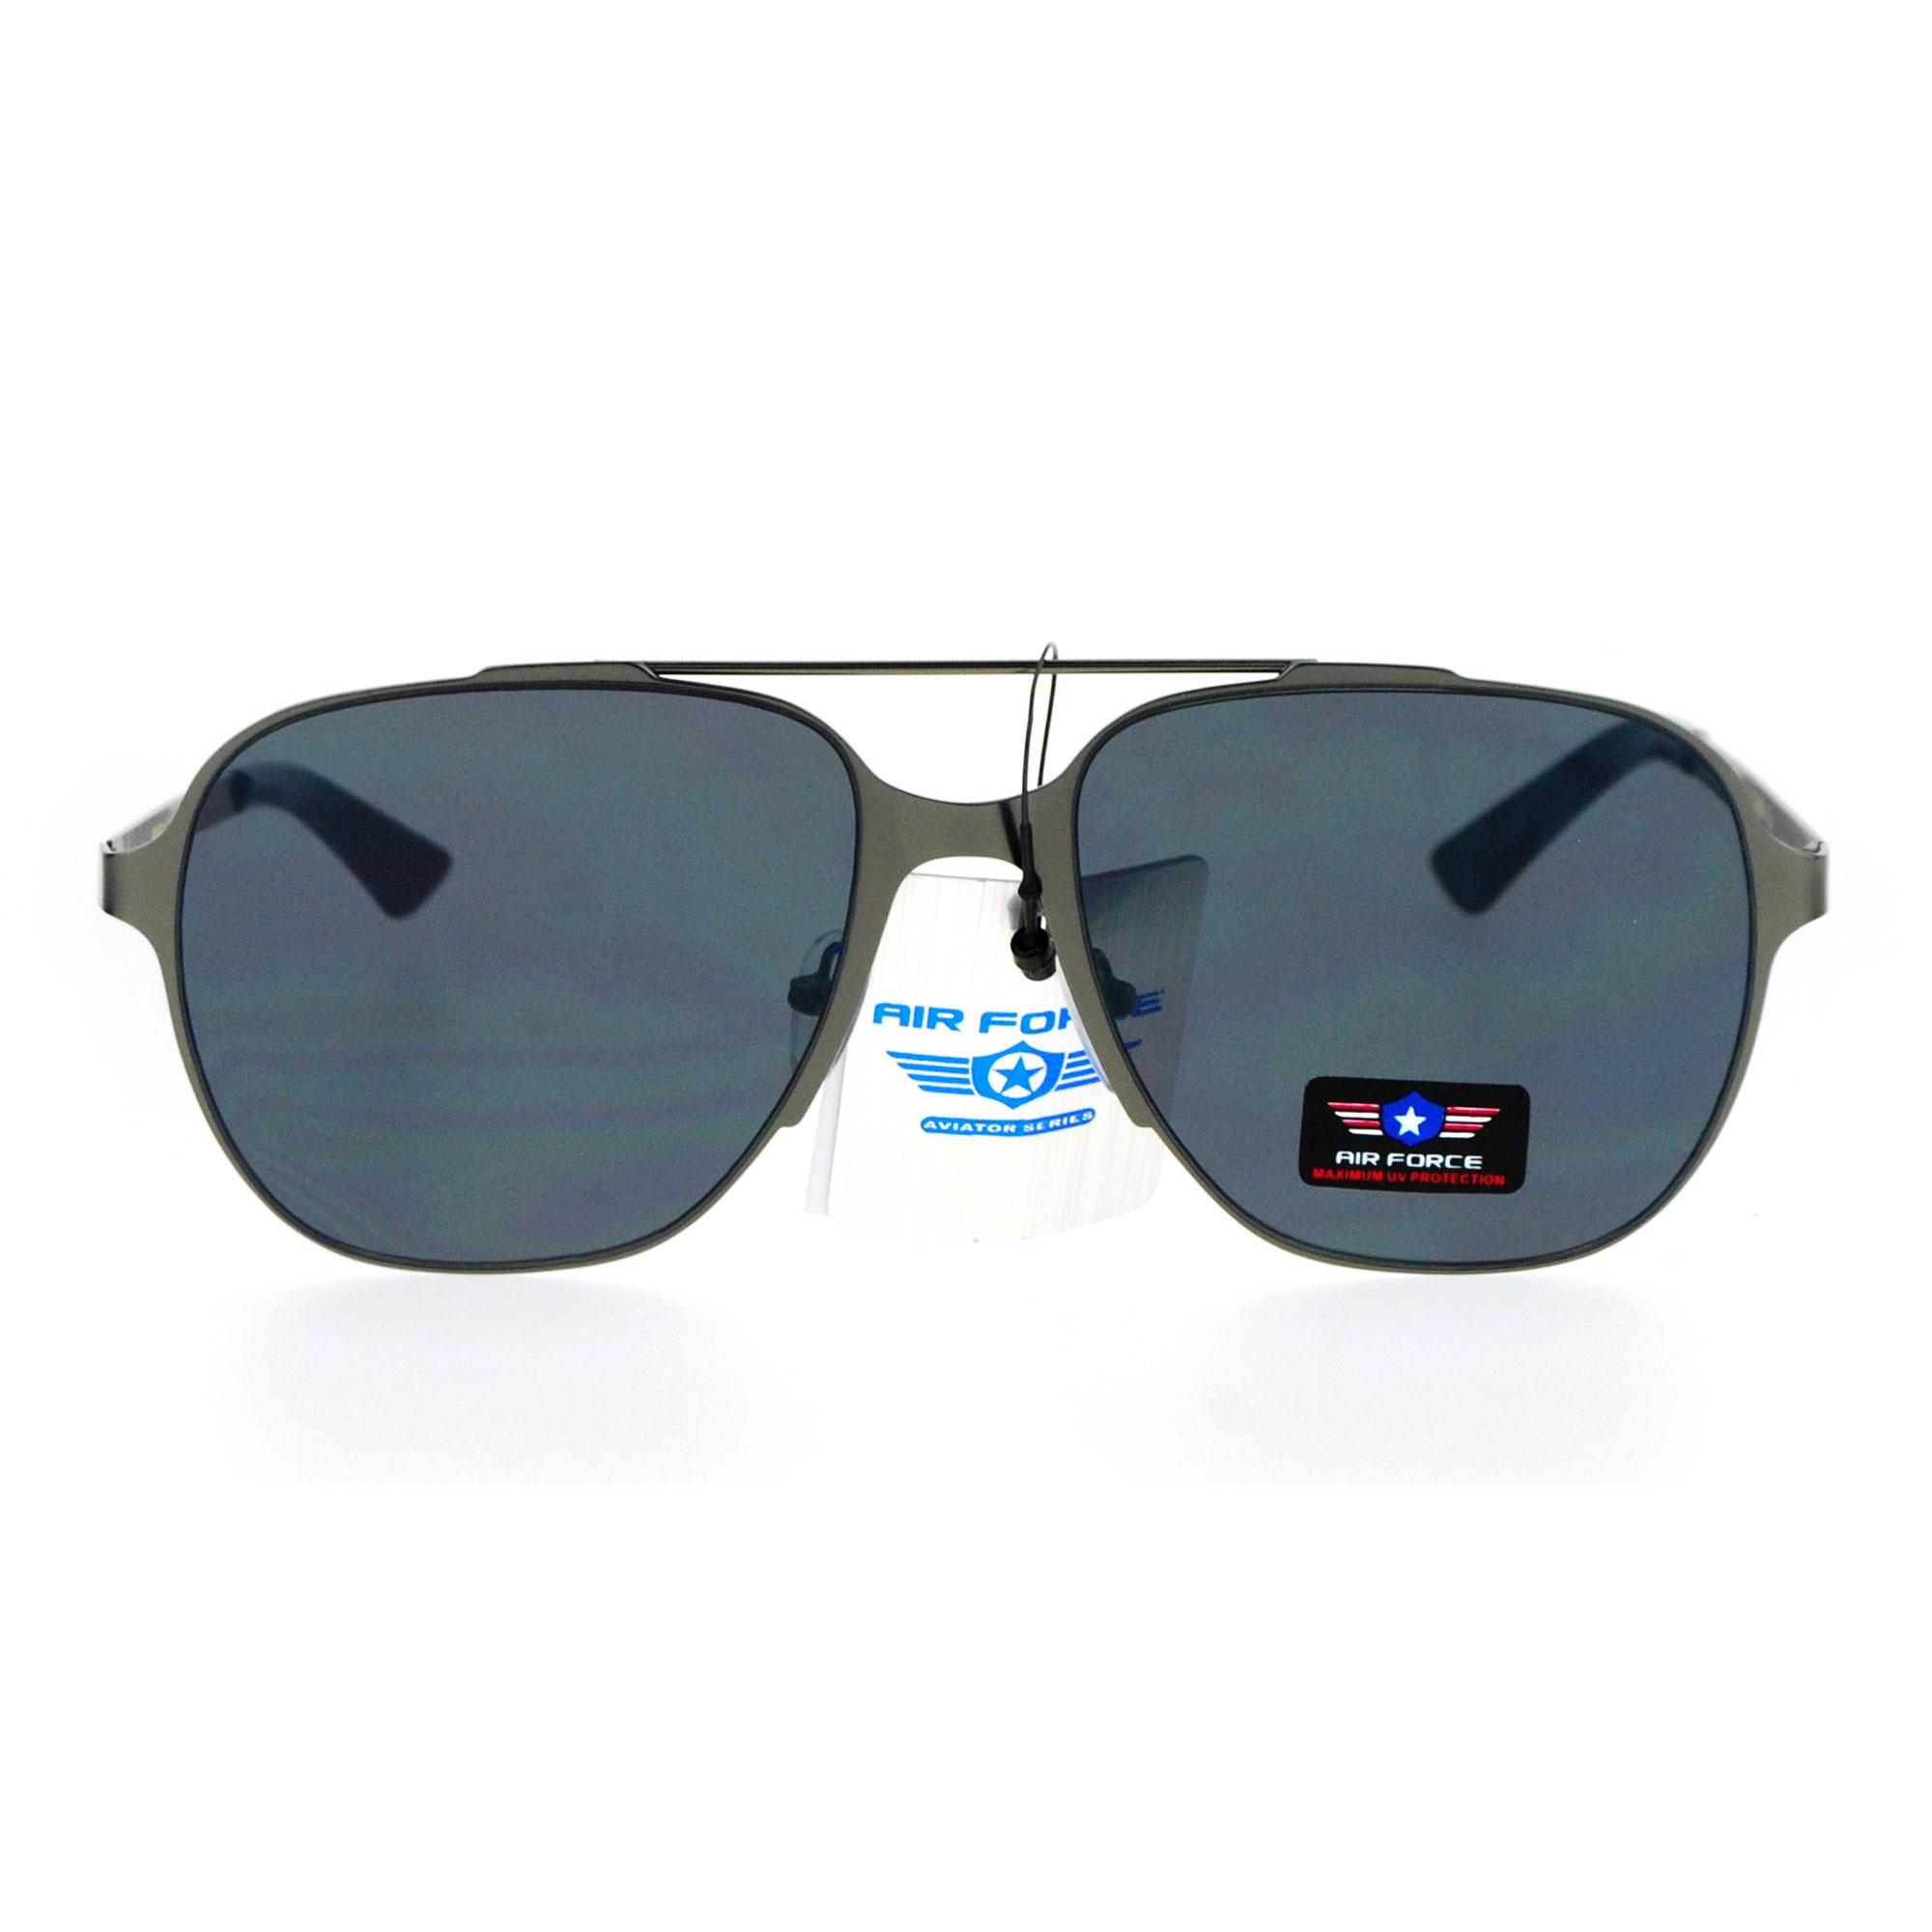 Air Force Aviator Sunglasses  air force flat lens metal frame futuristic aviator sunglasses ebay